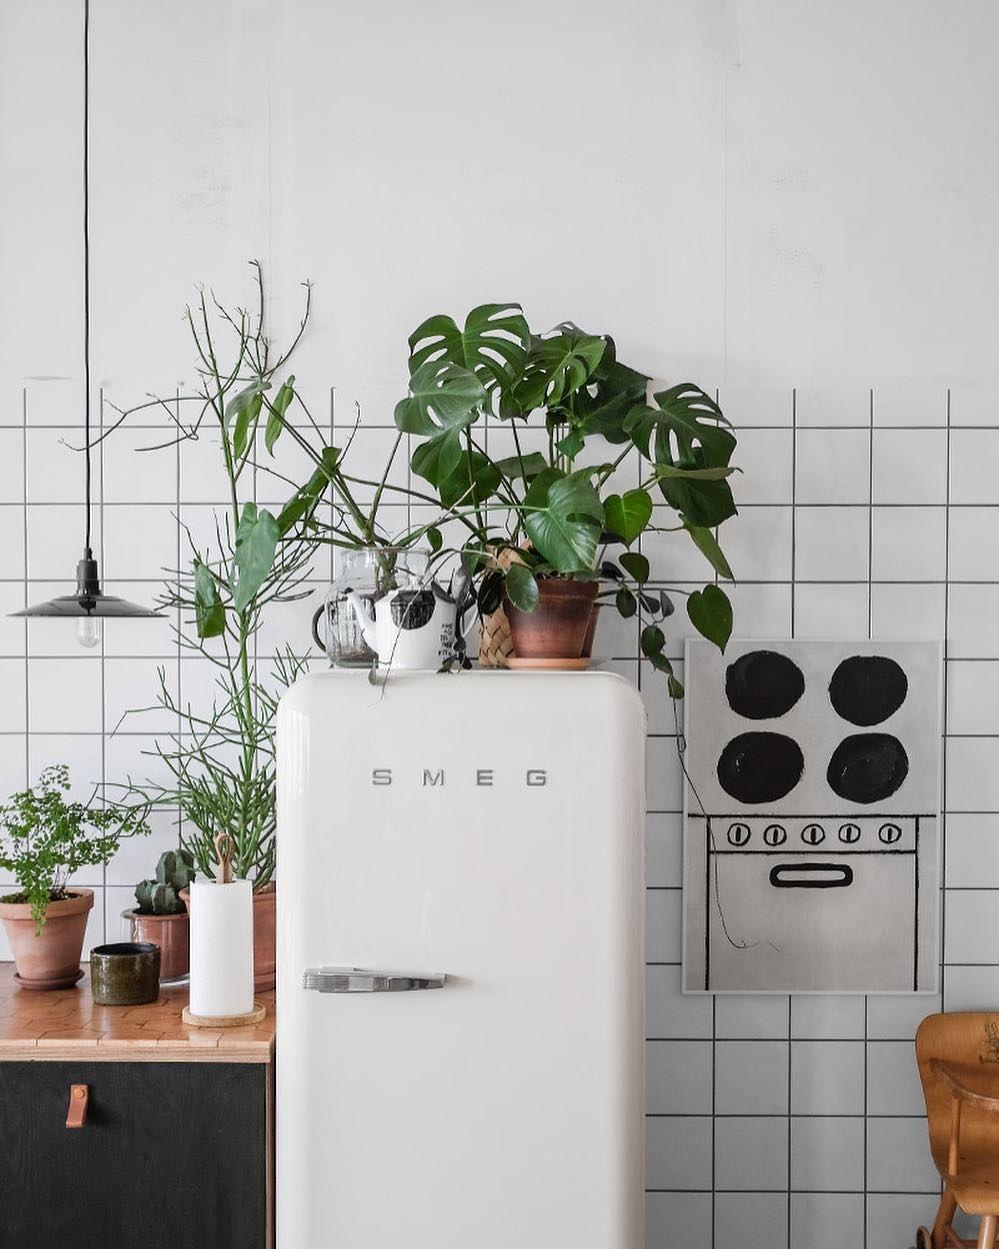 Pin by Alexandra Bilski on Brick Fetish | Pinterest | Smeg fridge ...